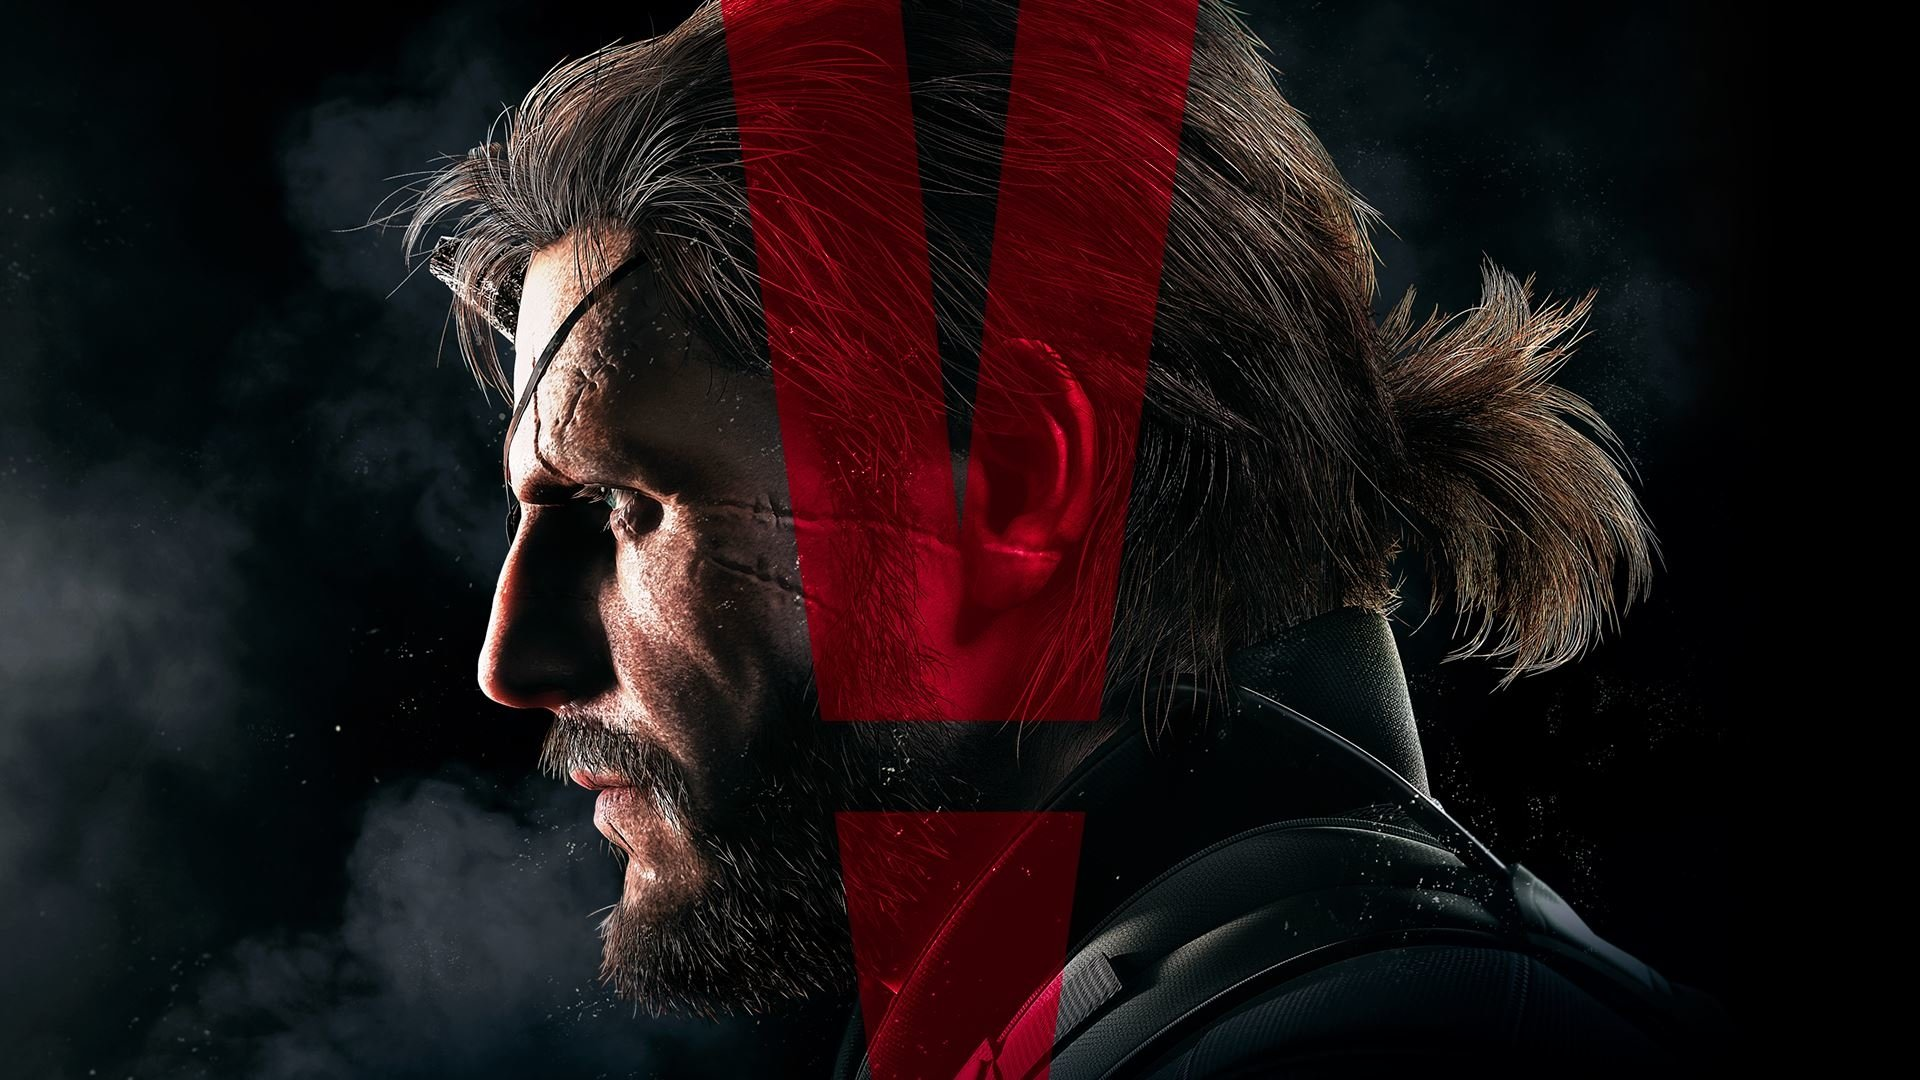 Metal Gear Solid 5 Wallpaper